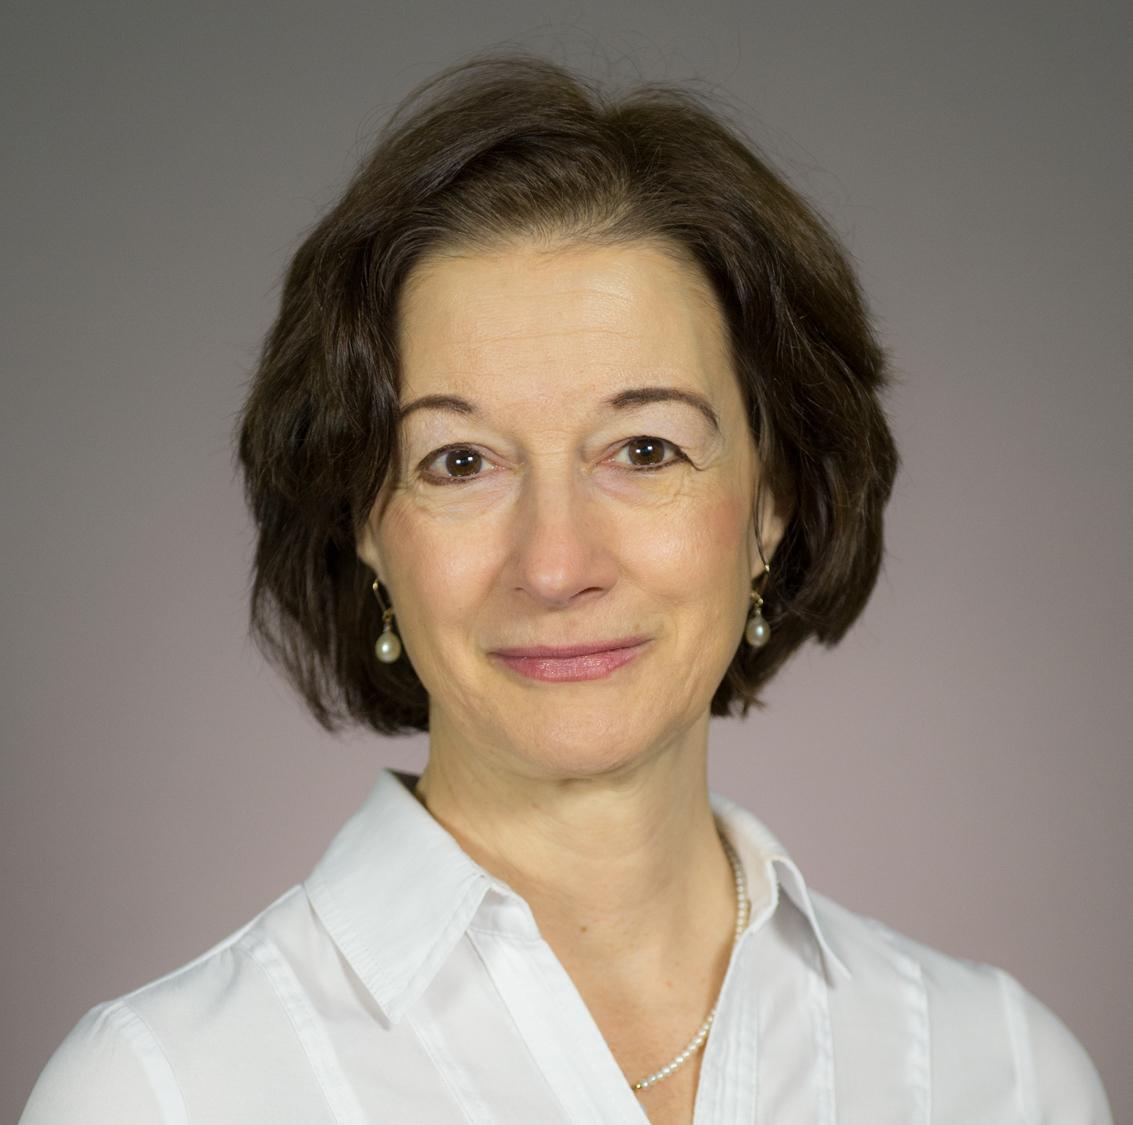 Julia McKinstry